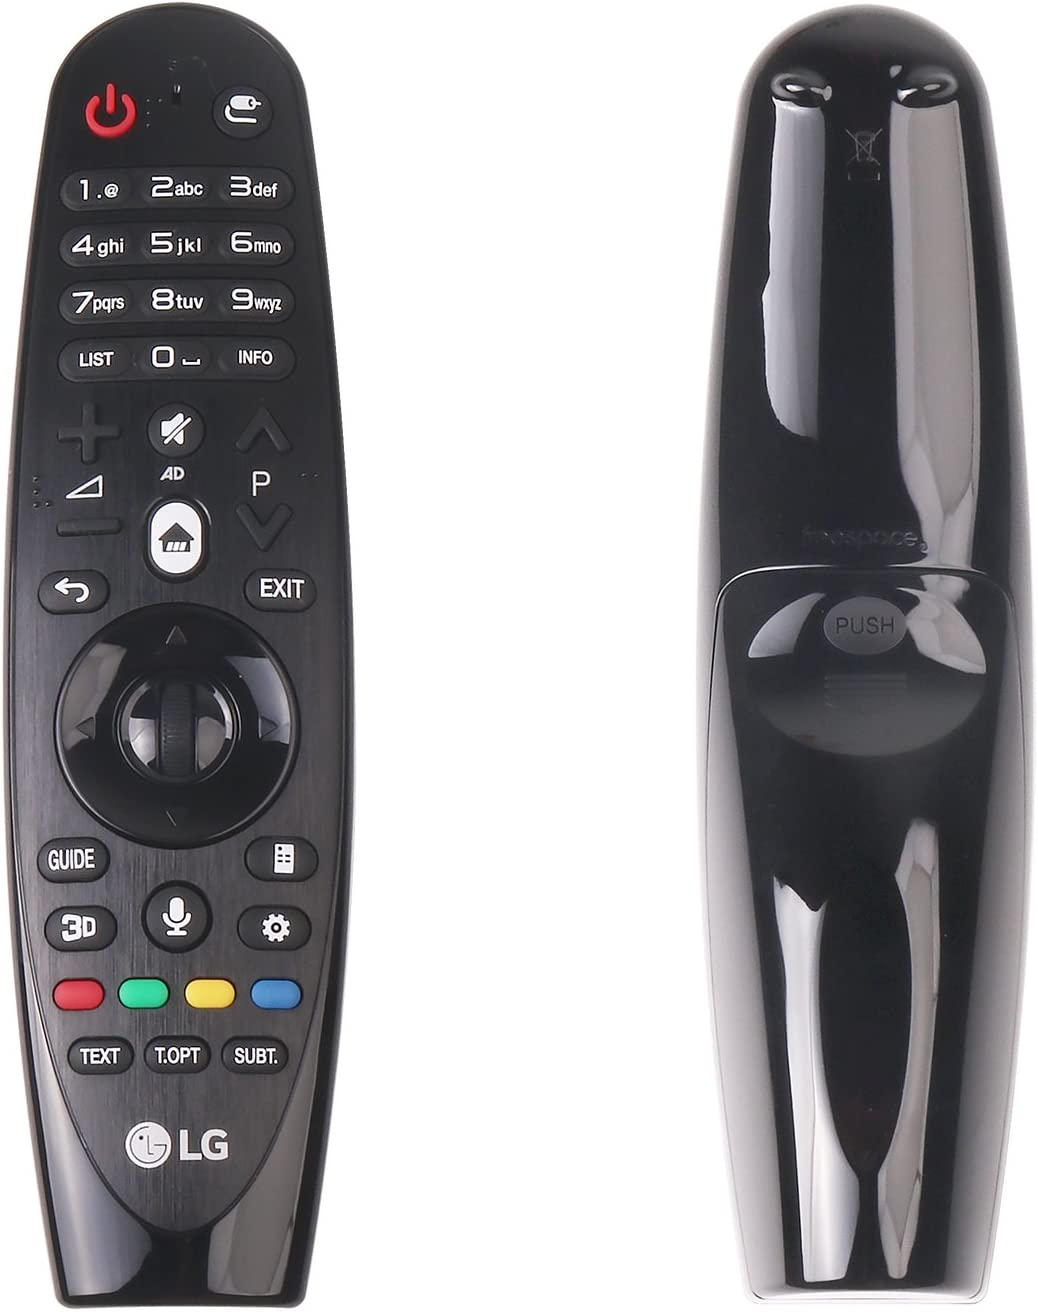 Mando a Distancia Original LG AN-MR600 SIKAI de Repuesto Original AN-MR600 Magic con Voice Mate para LG Serie 2015 Smart TV: Amazon.es: Electrónica